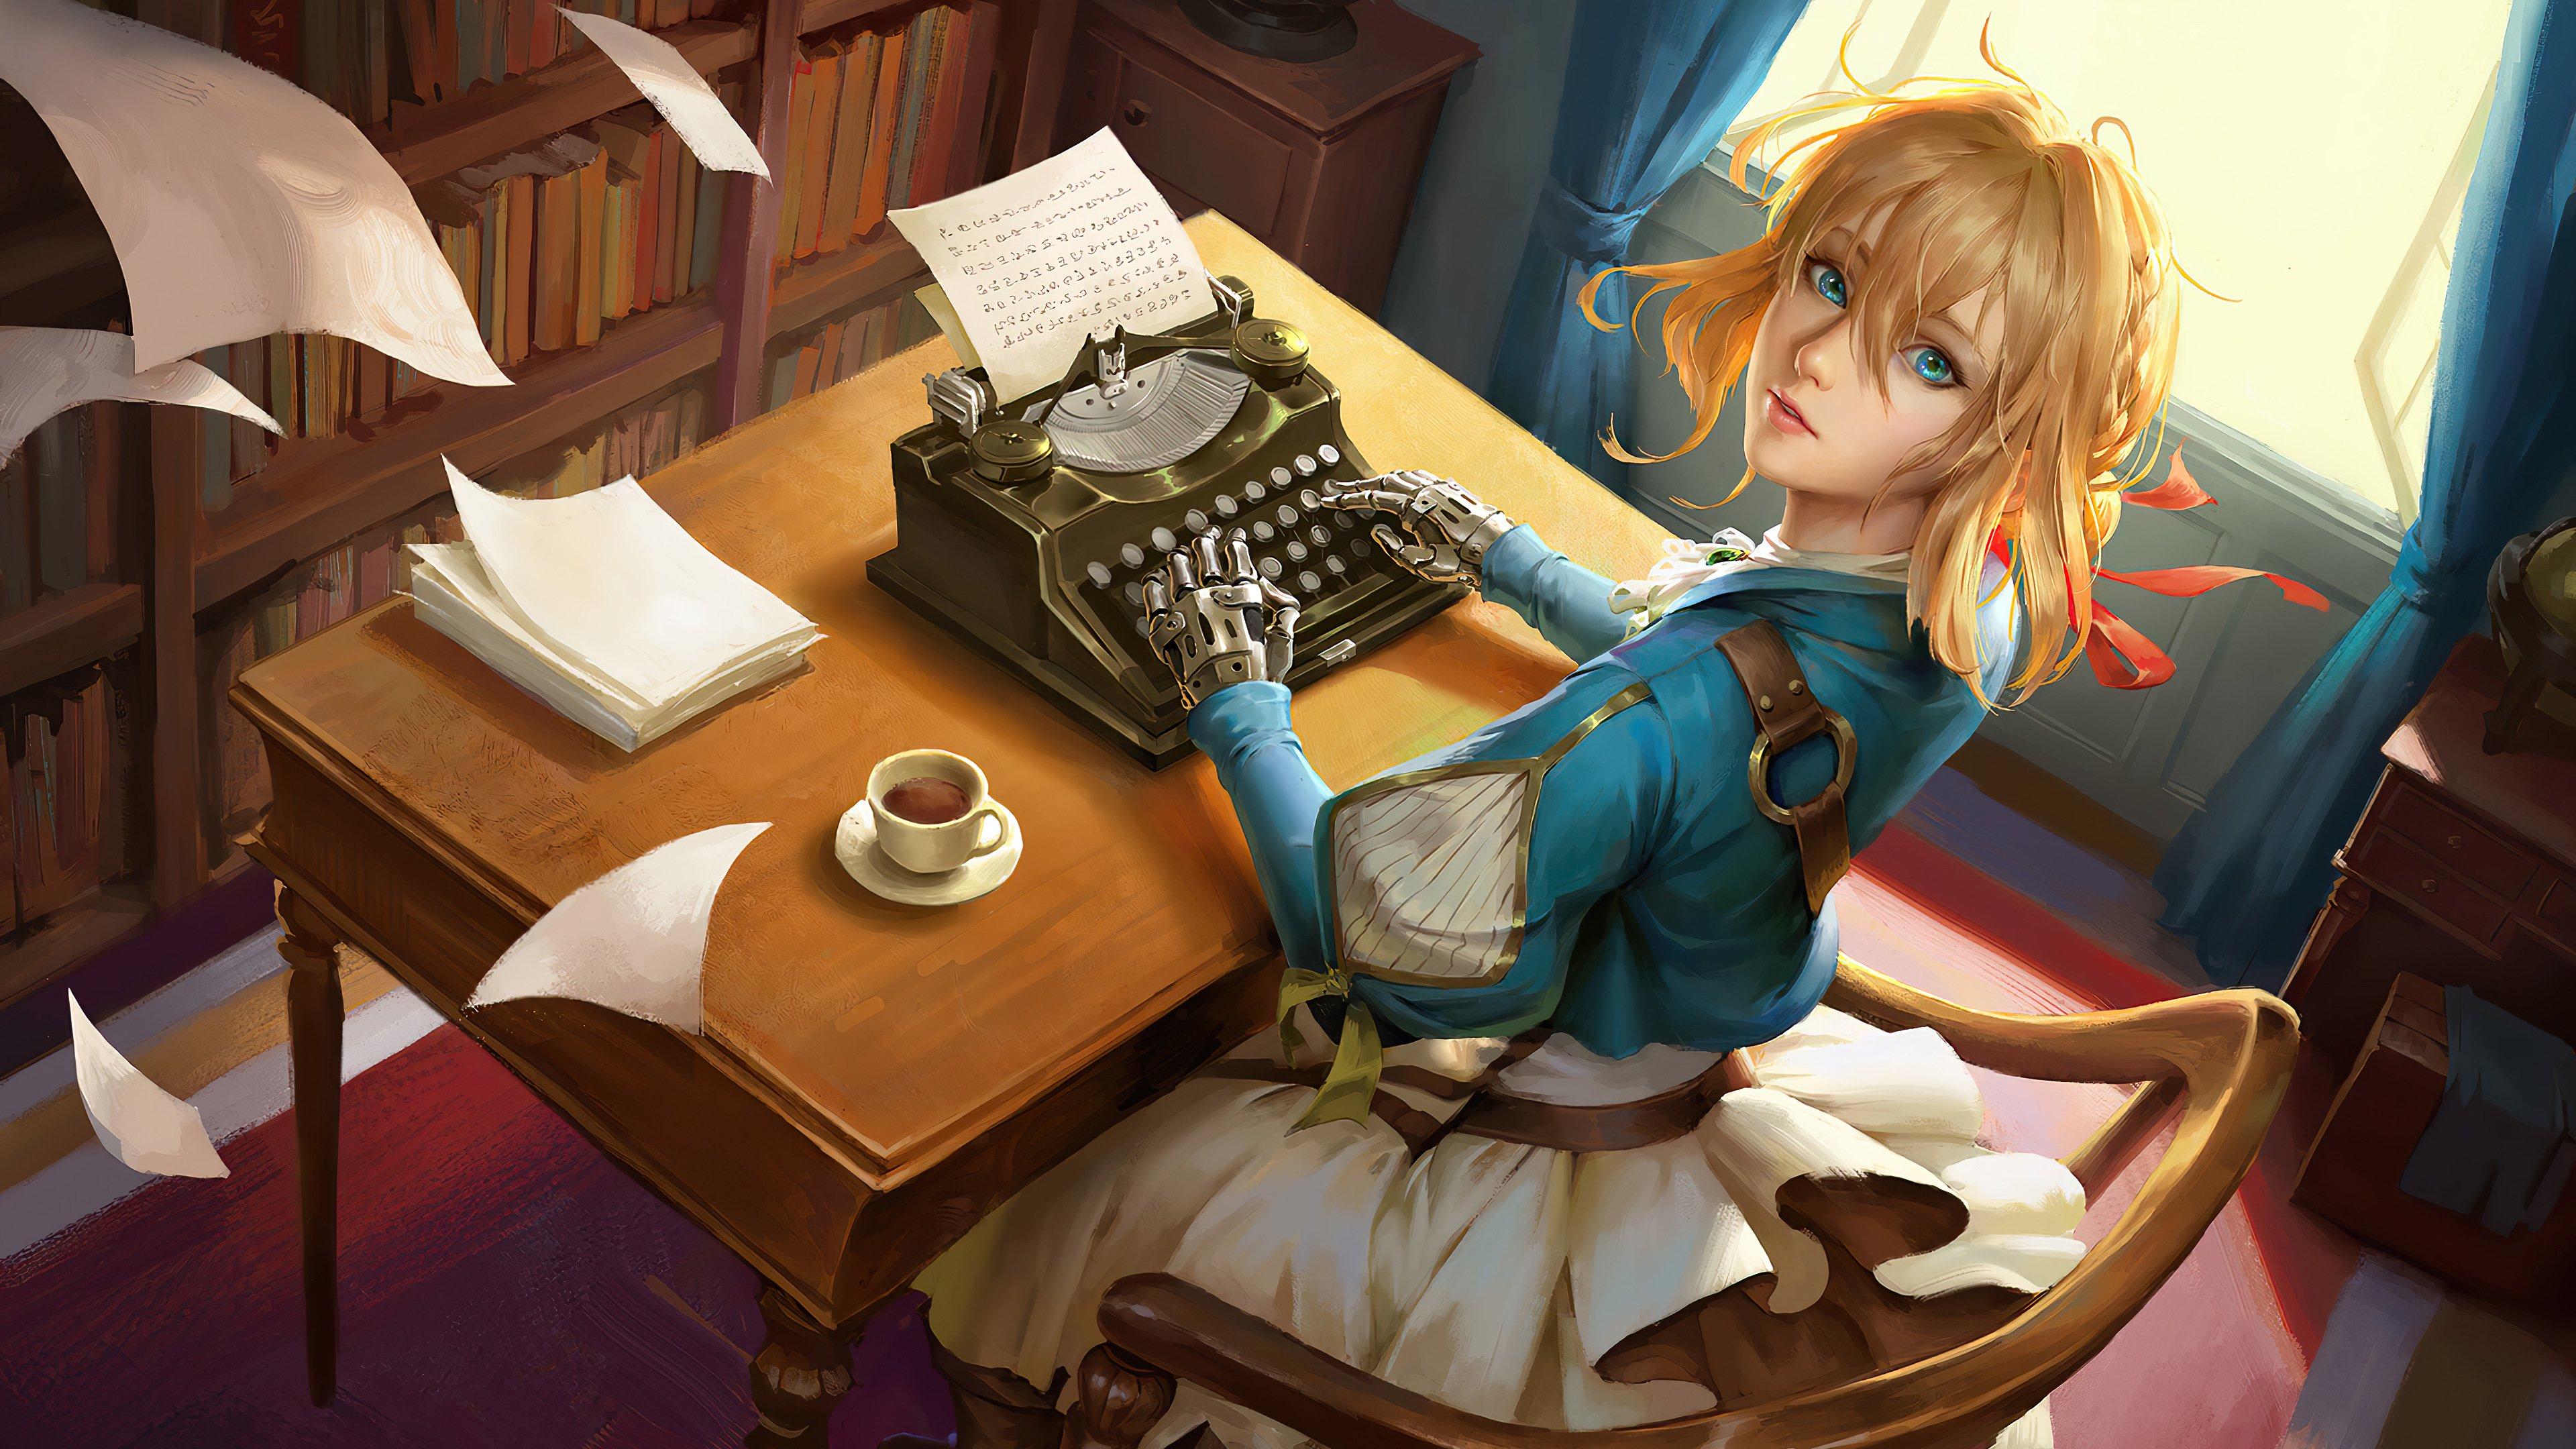 Anime Wallpaper Violet Evergarden with typewriter